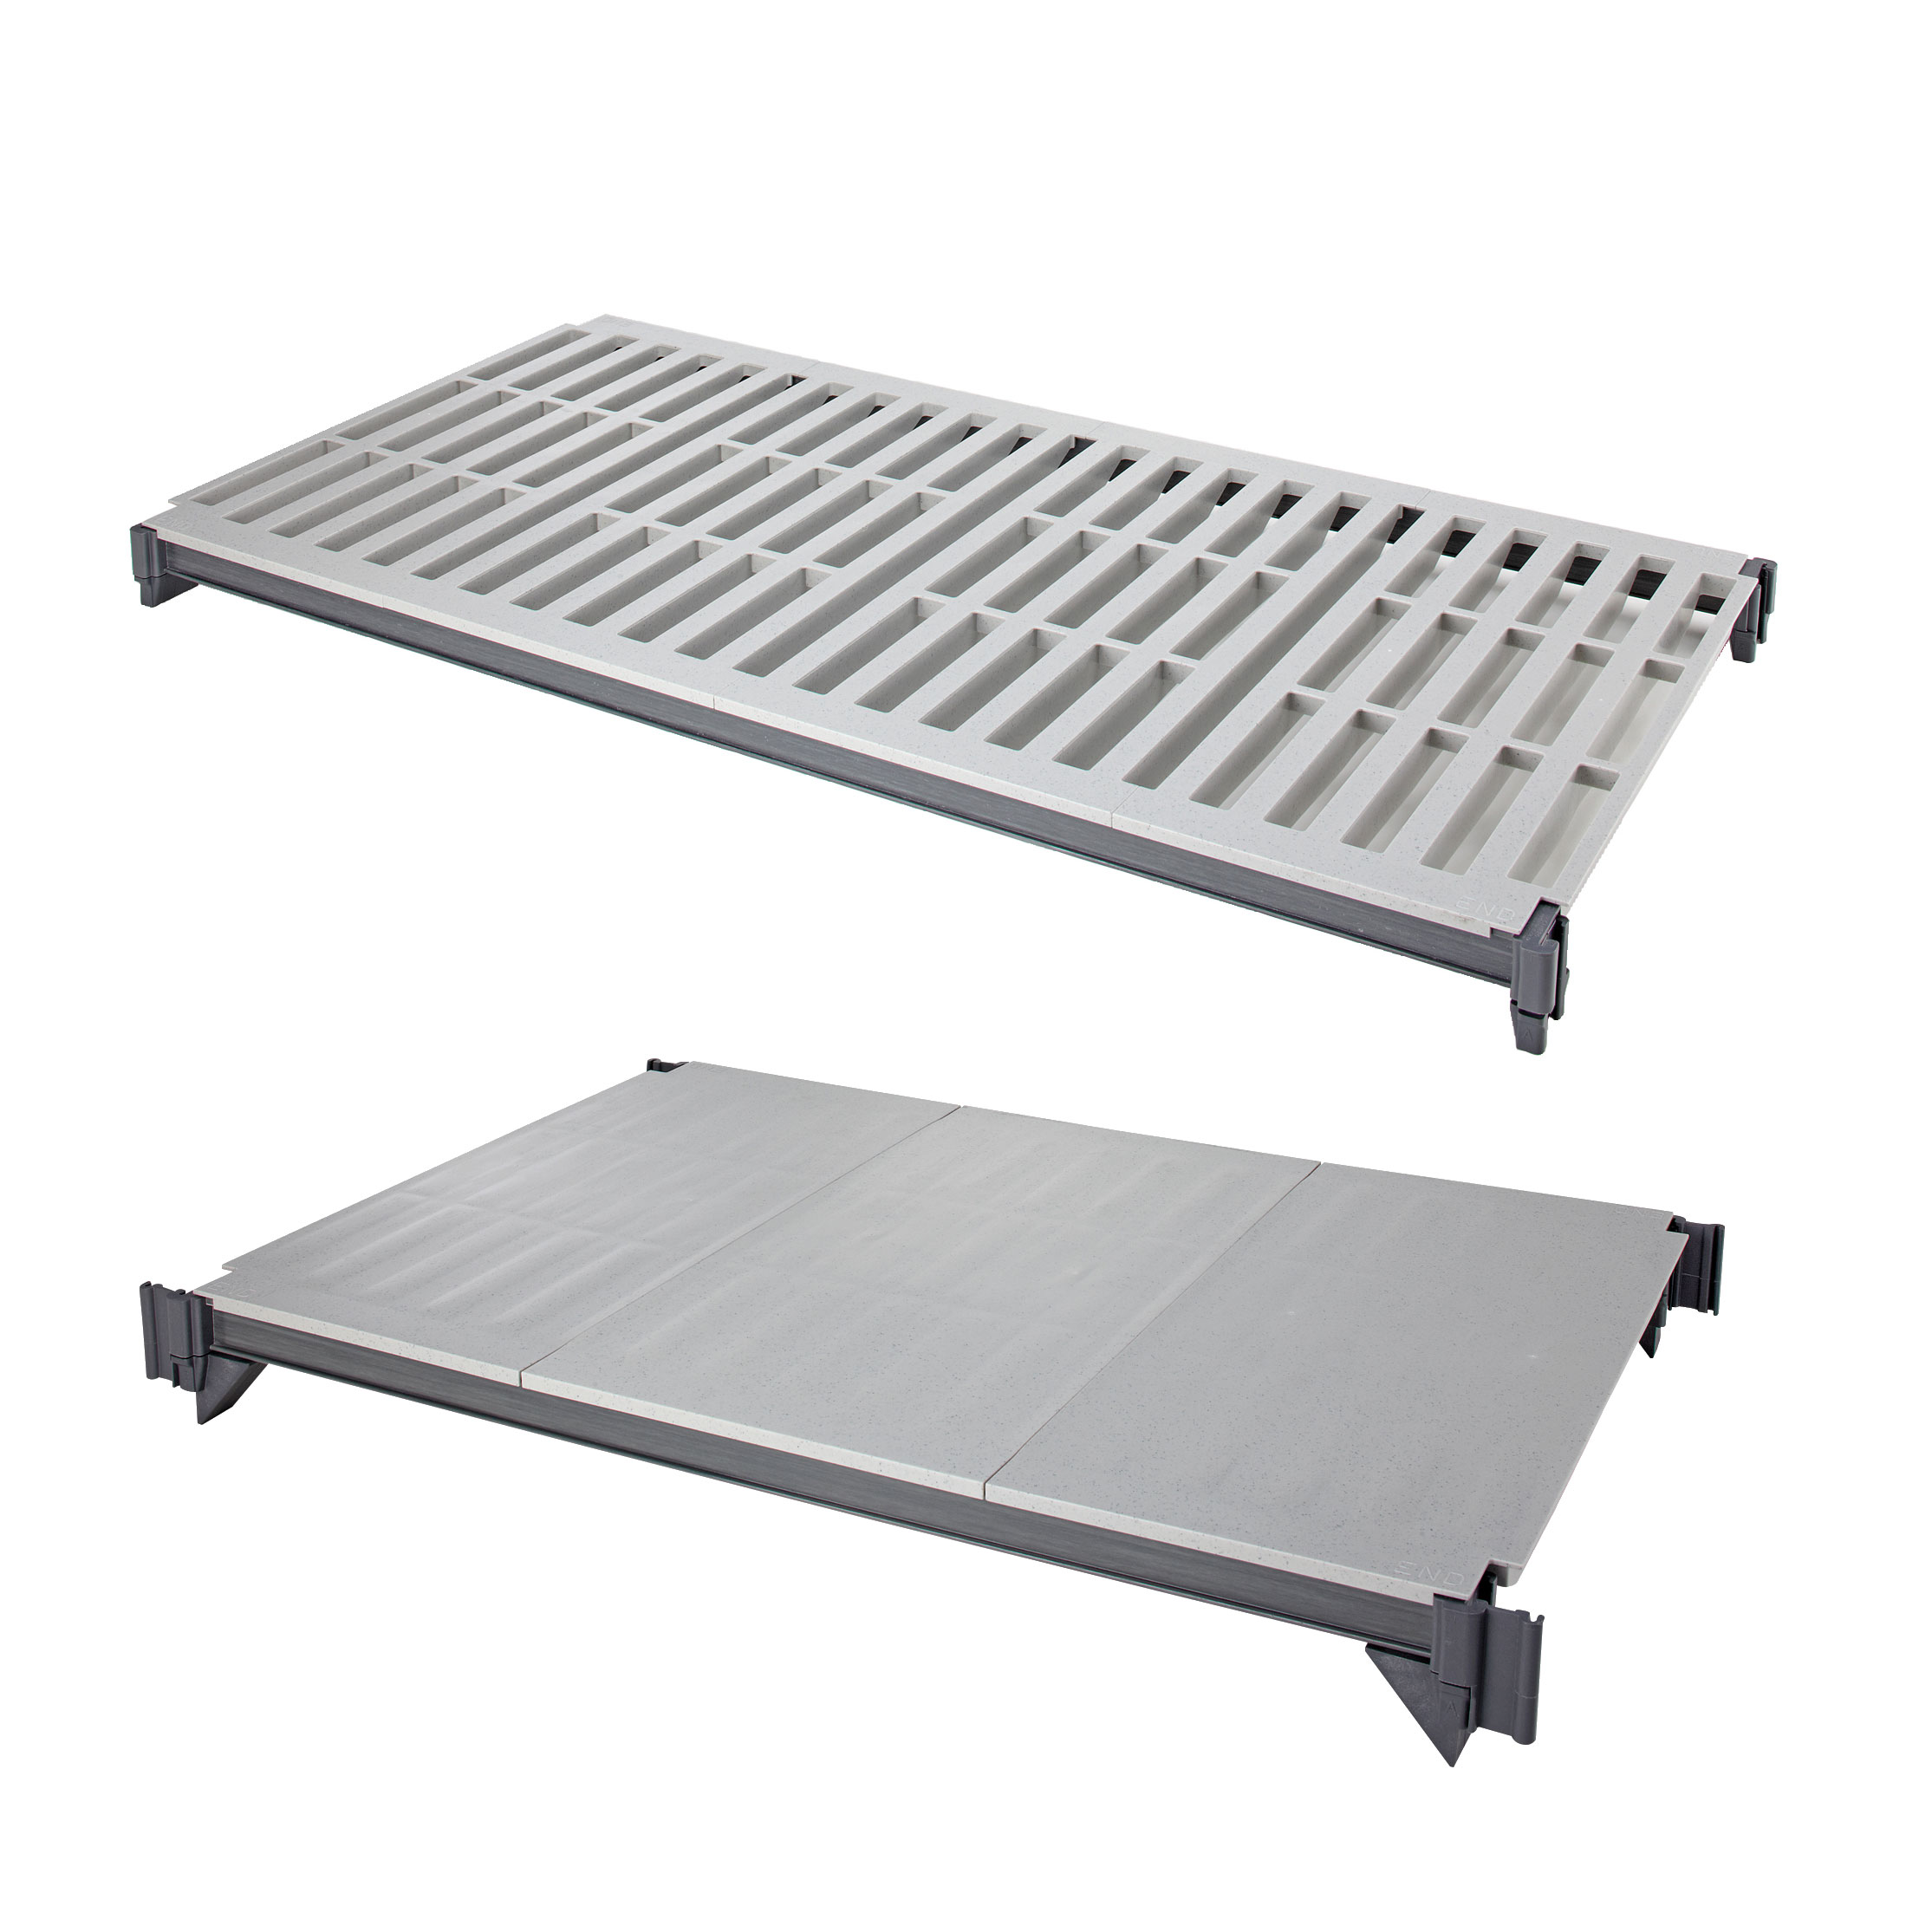 Cambro ESK2448VS5580 shelving/shelving systems